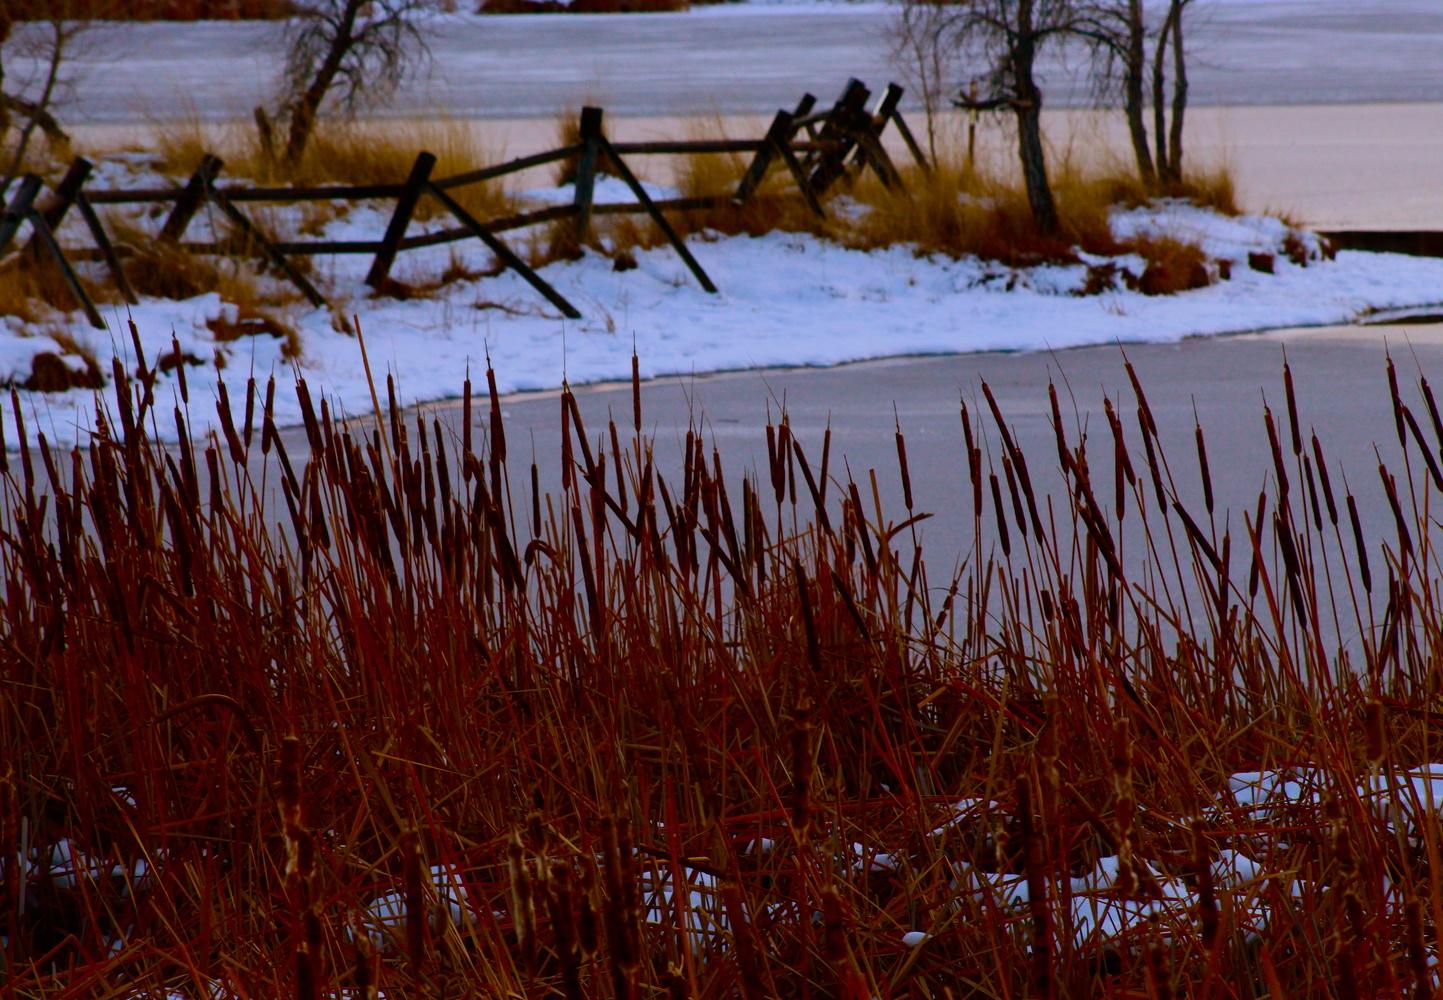 Pondside by Paddy Hackett